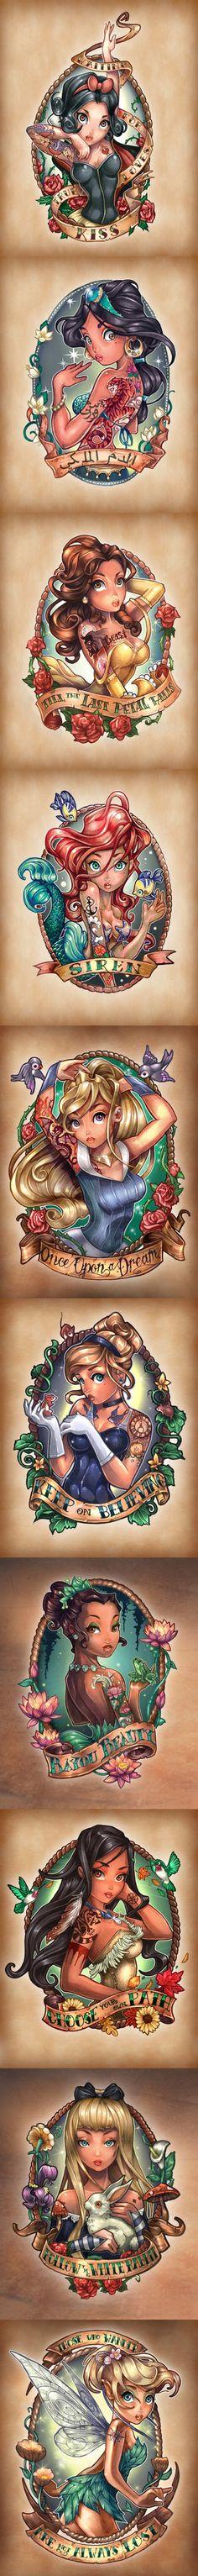 Disney prinsessen.